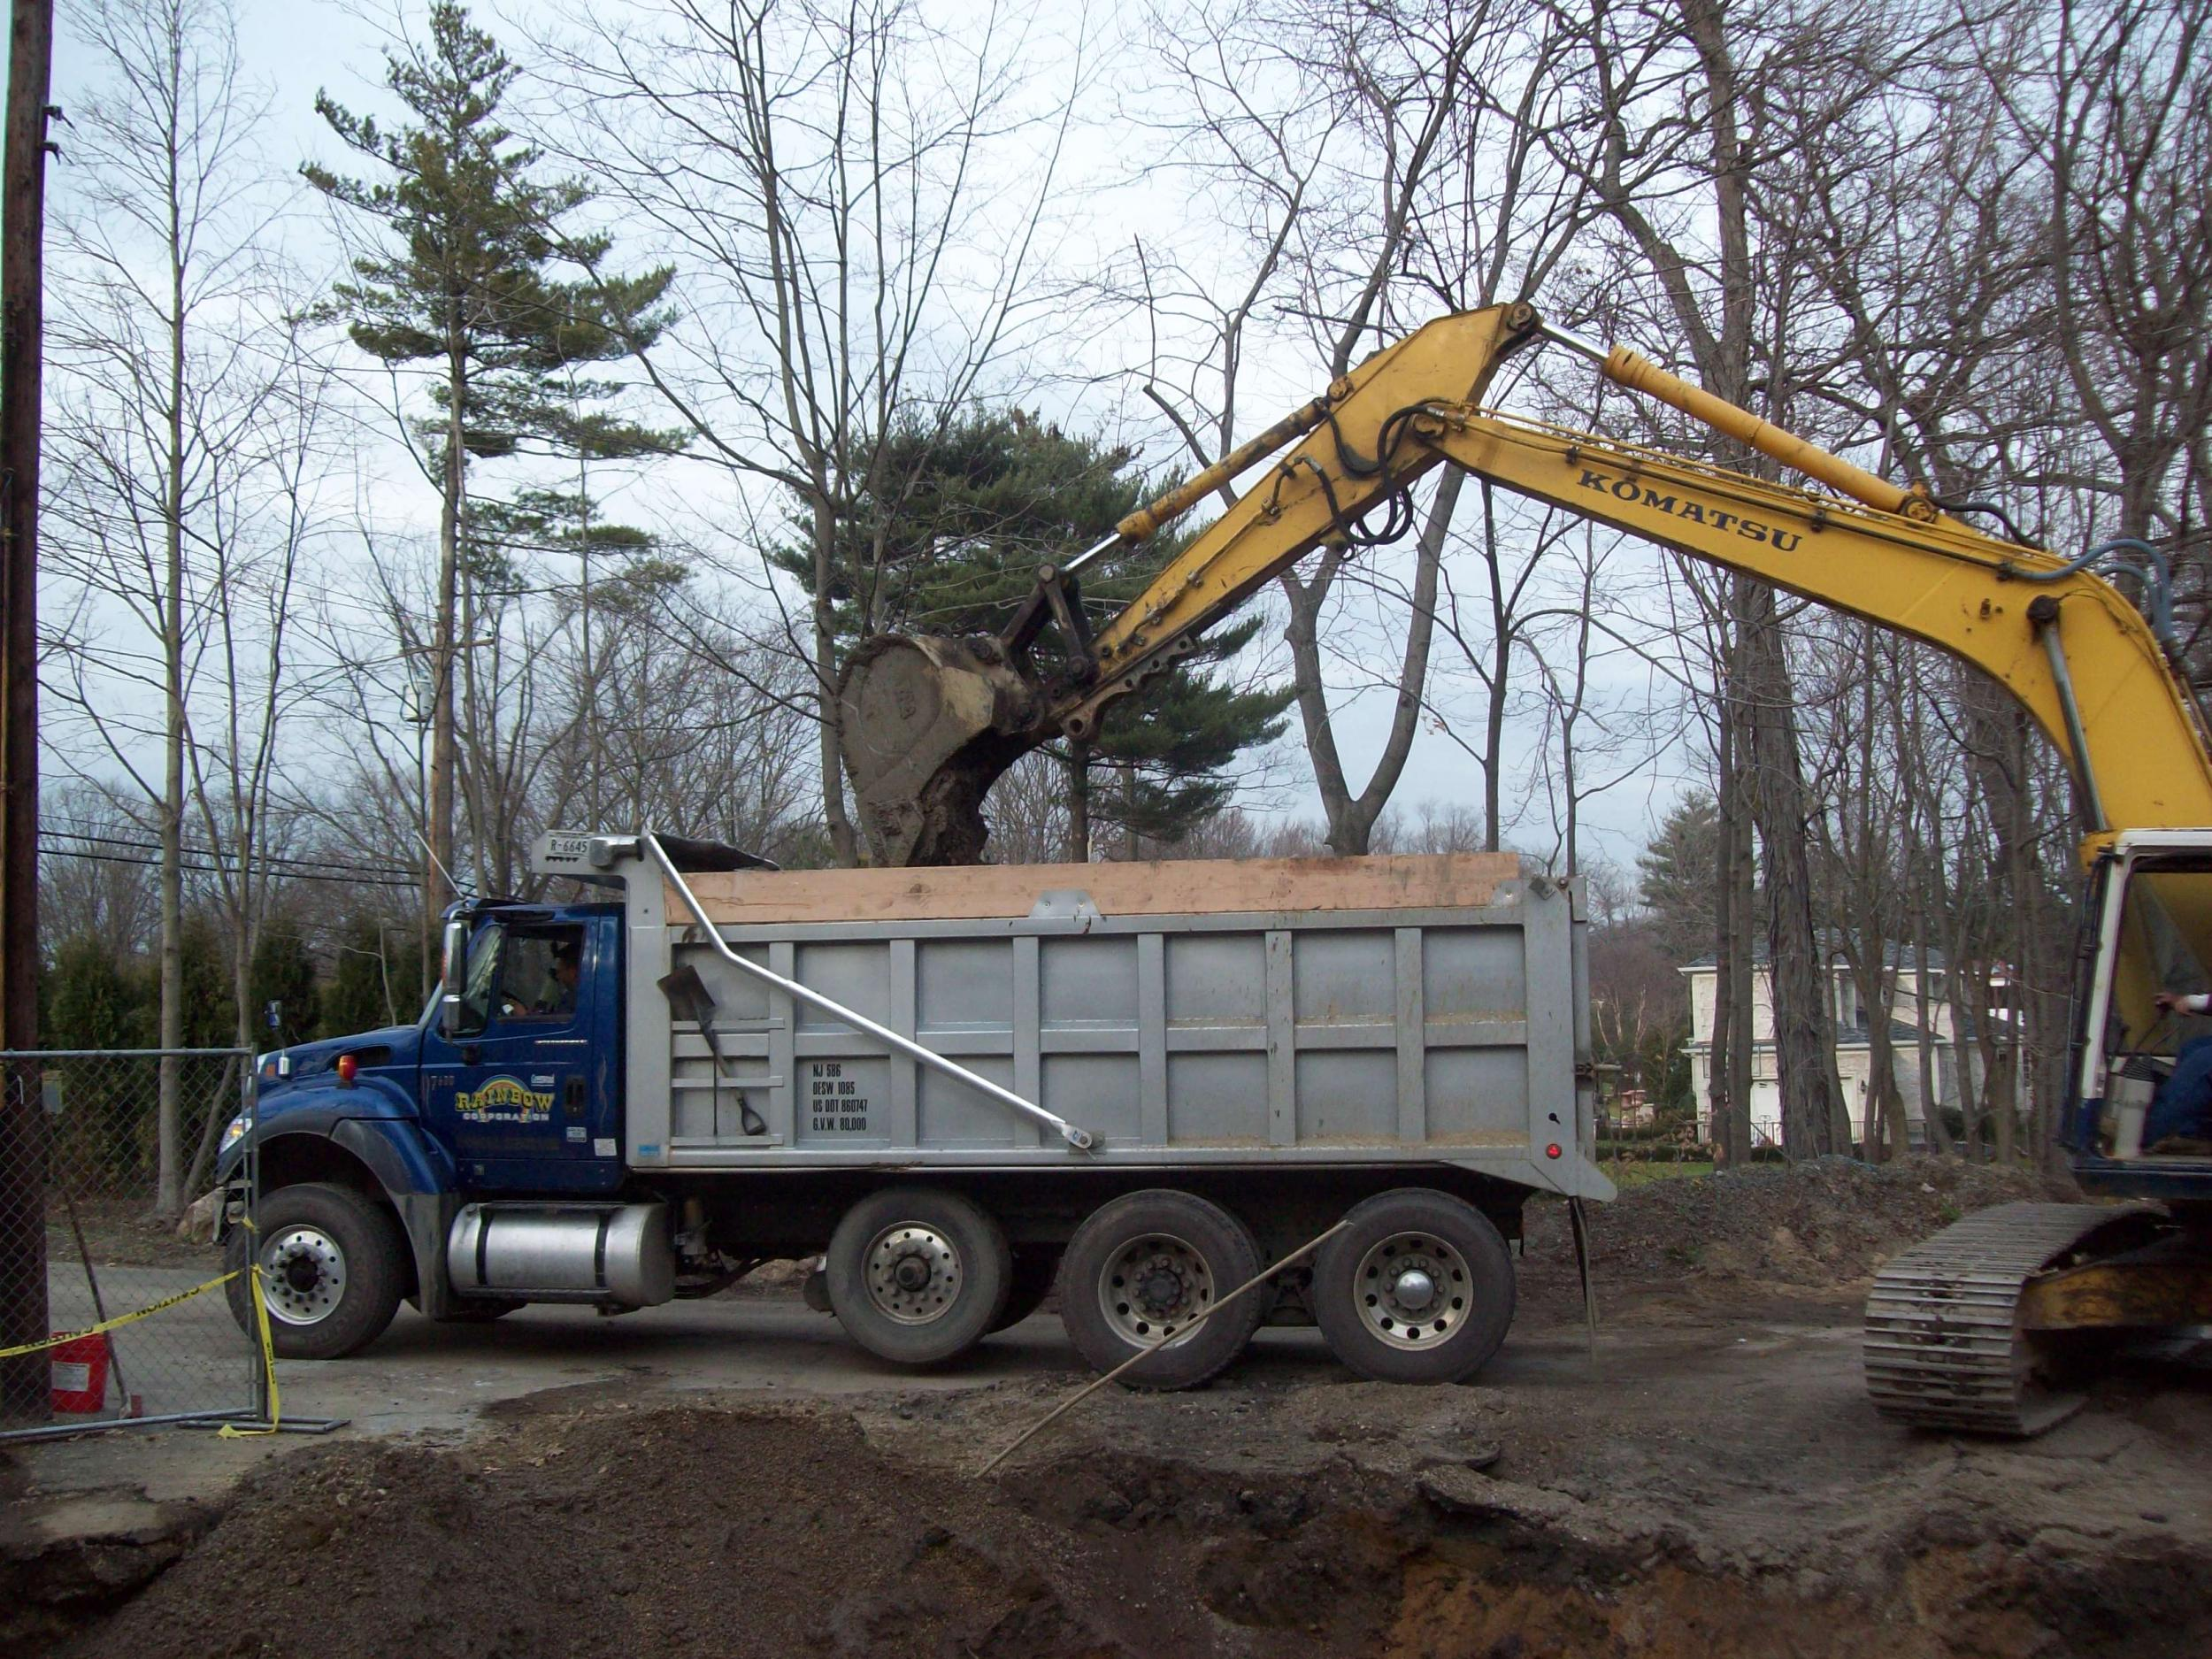 Excavator loading soil into a dump truck